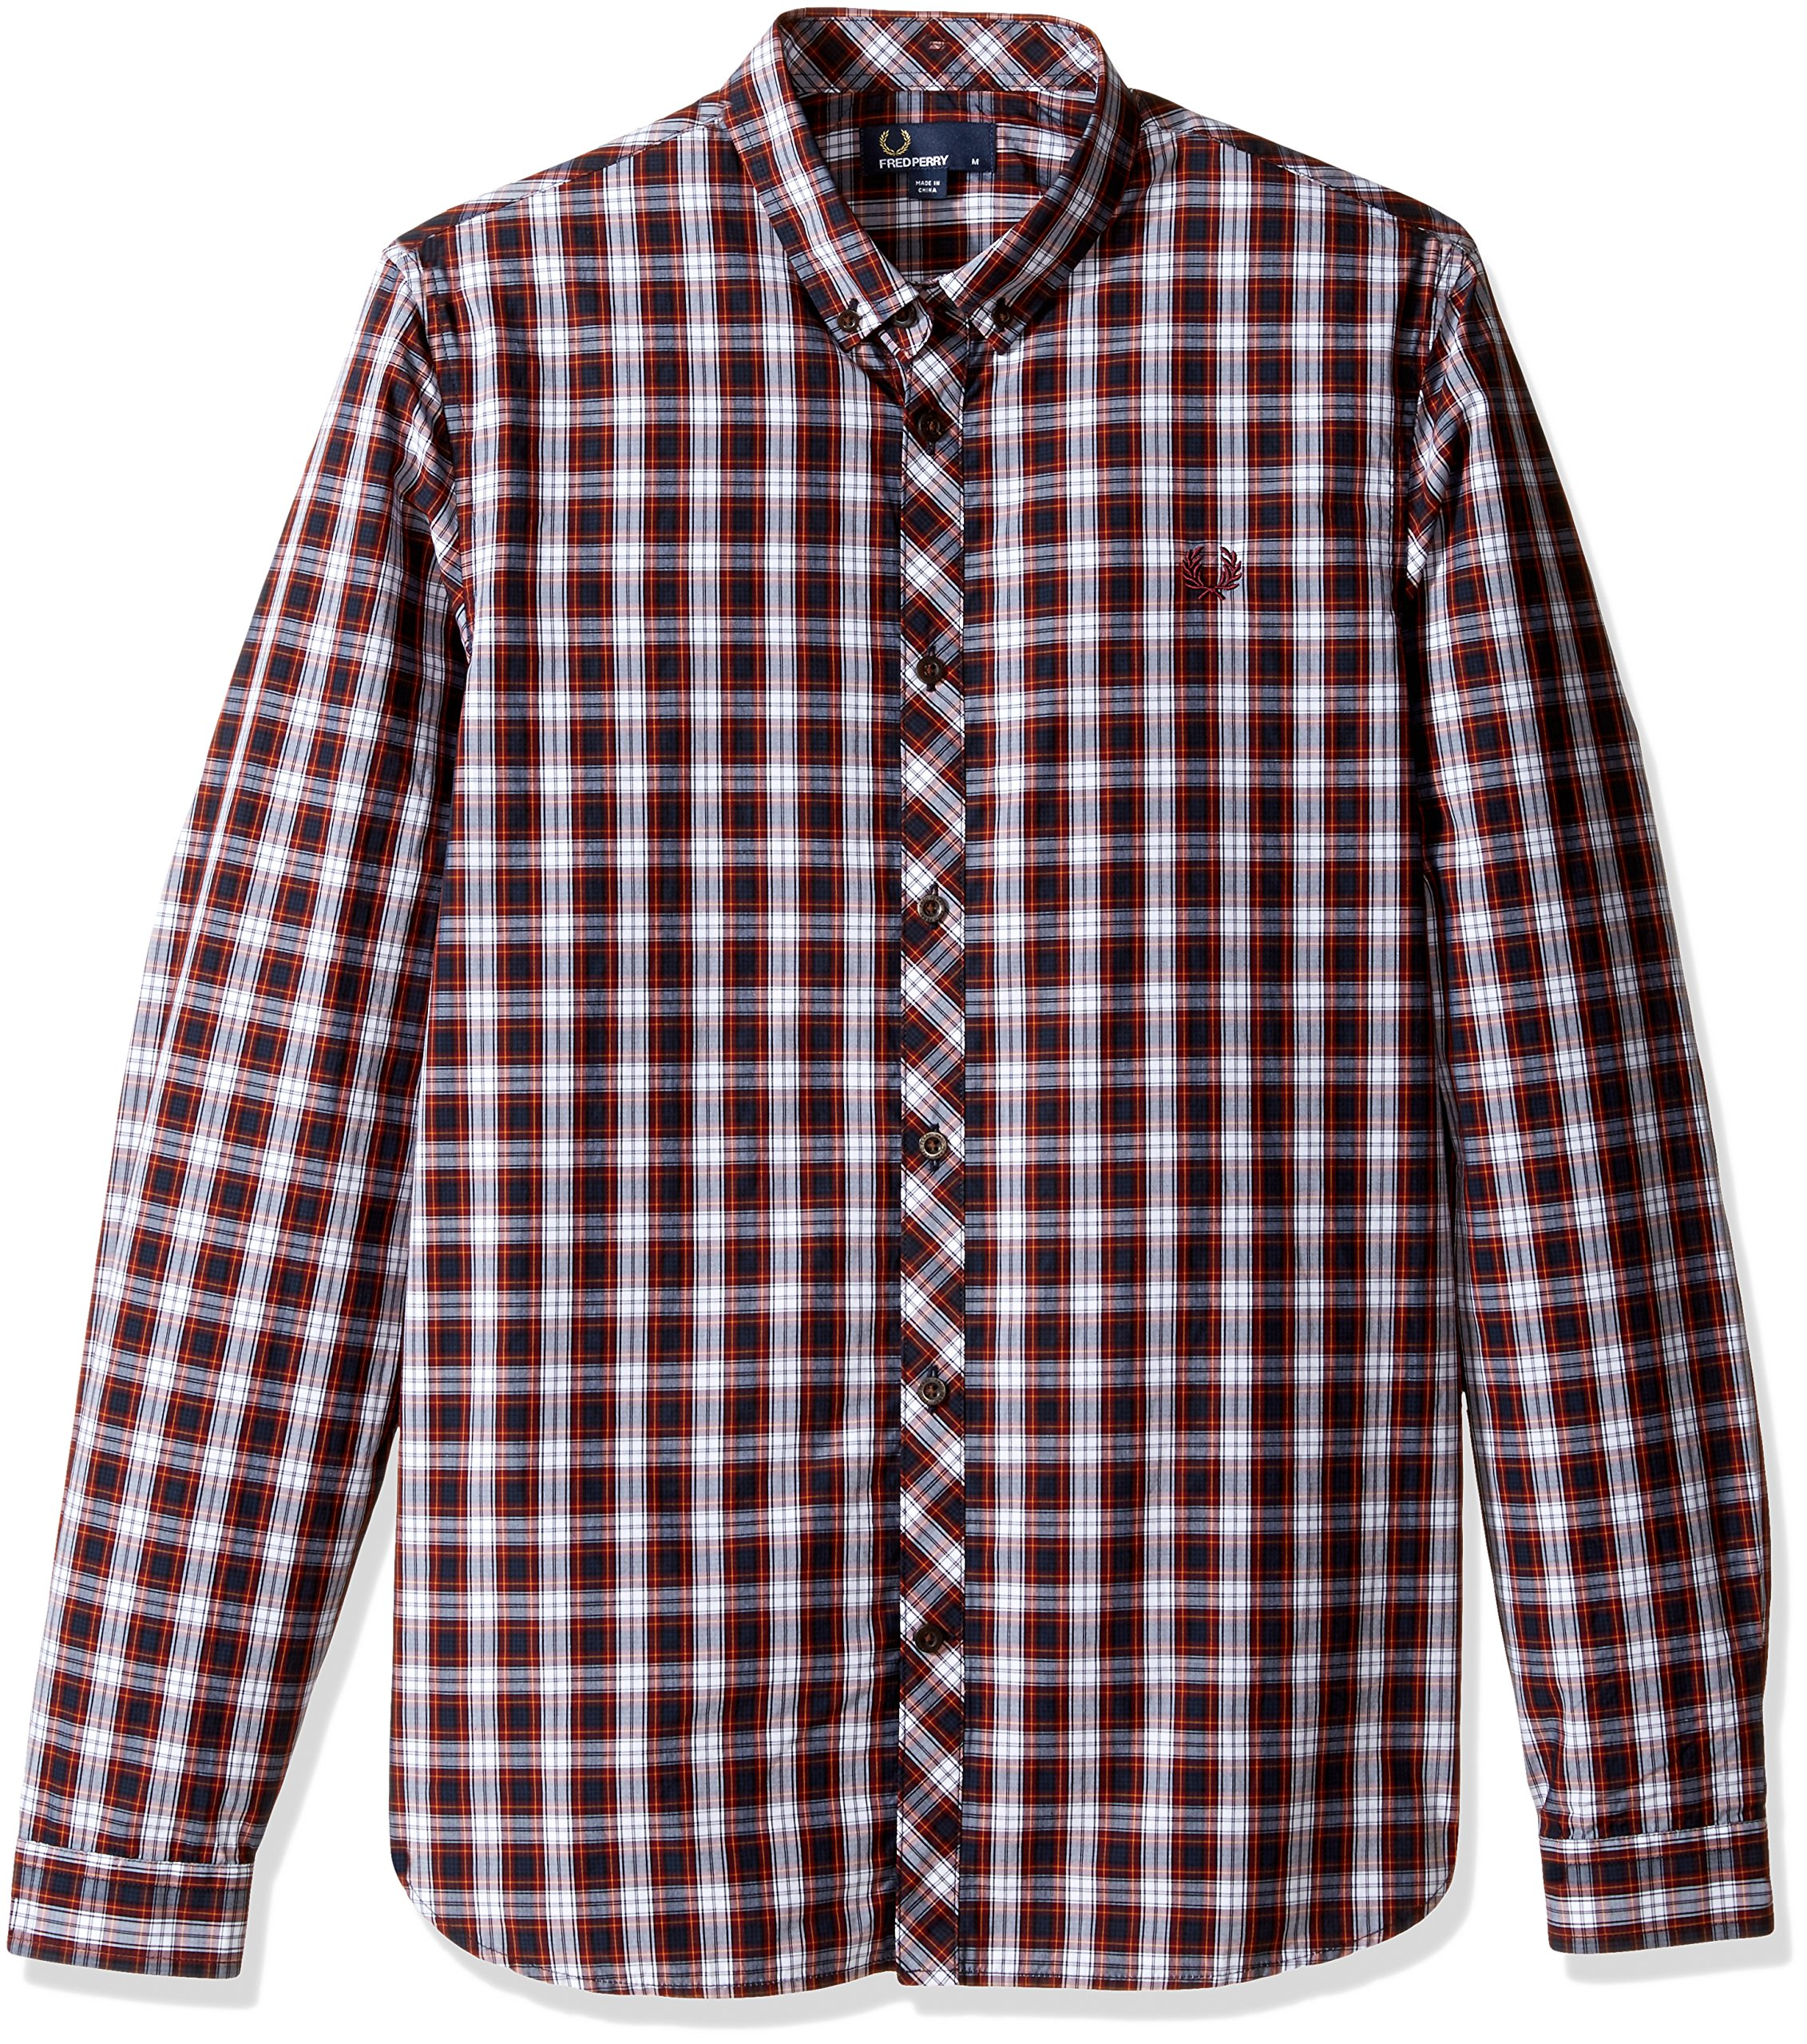 Fred Perry Men's Summer Tartan Shirt, Rosewood, X-Large